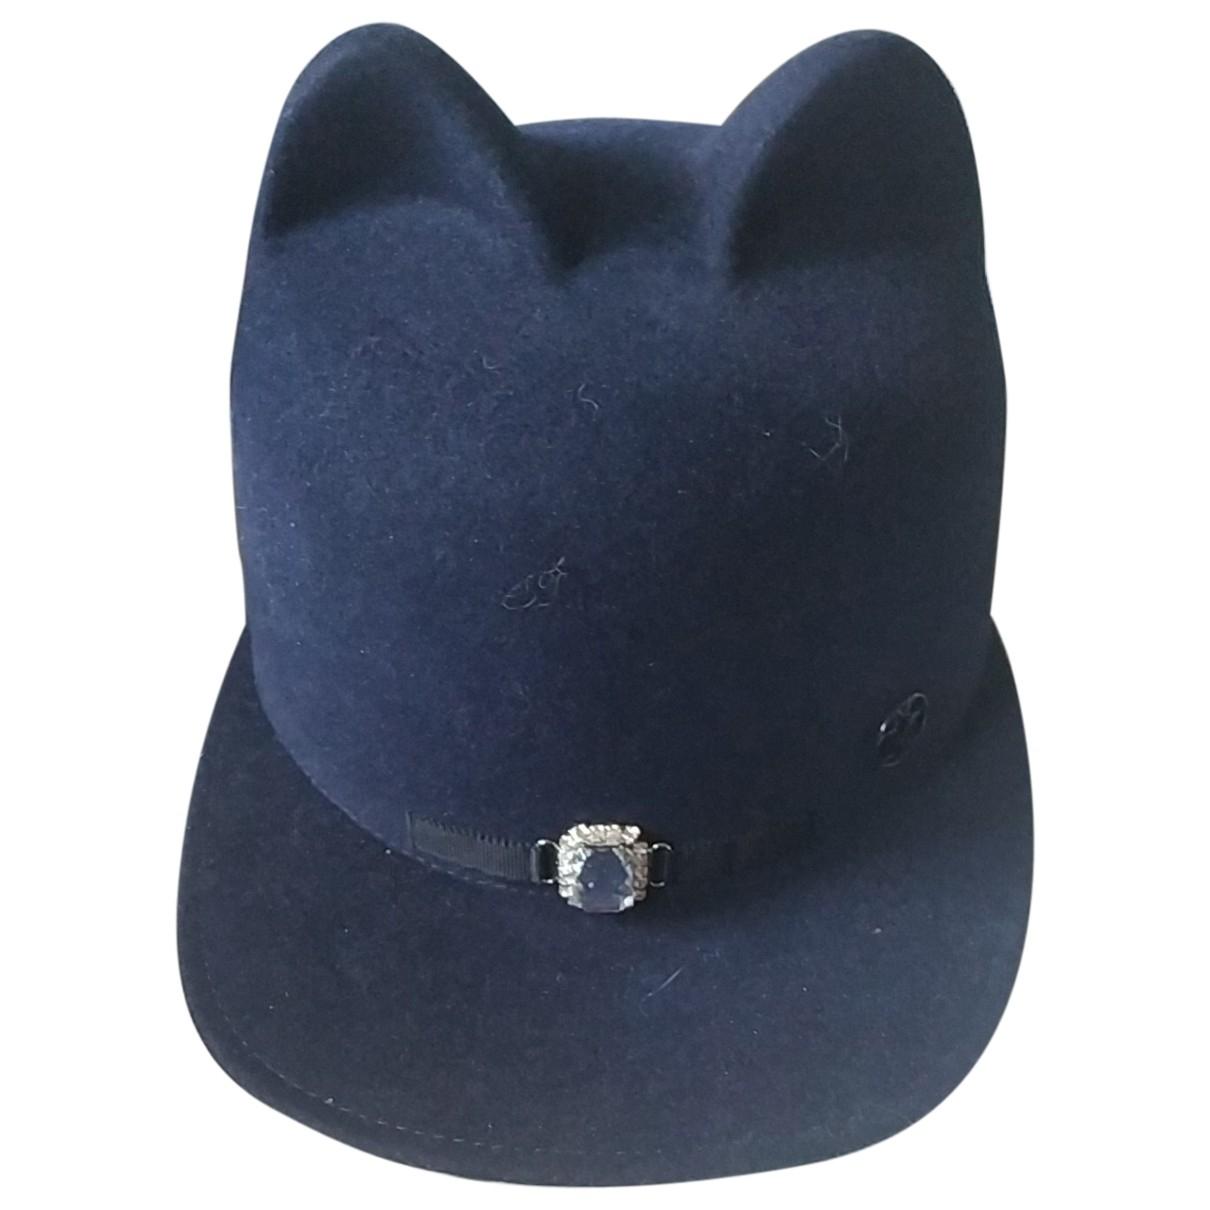 Maison Michel \N Blue Cotton hat for Women S International